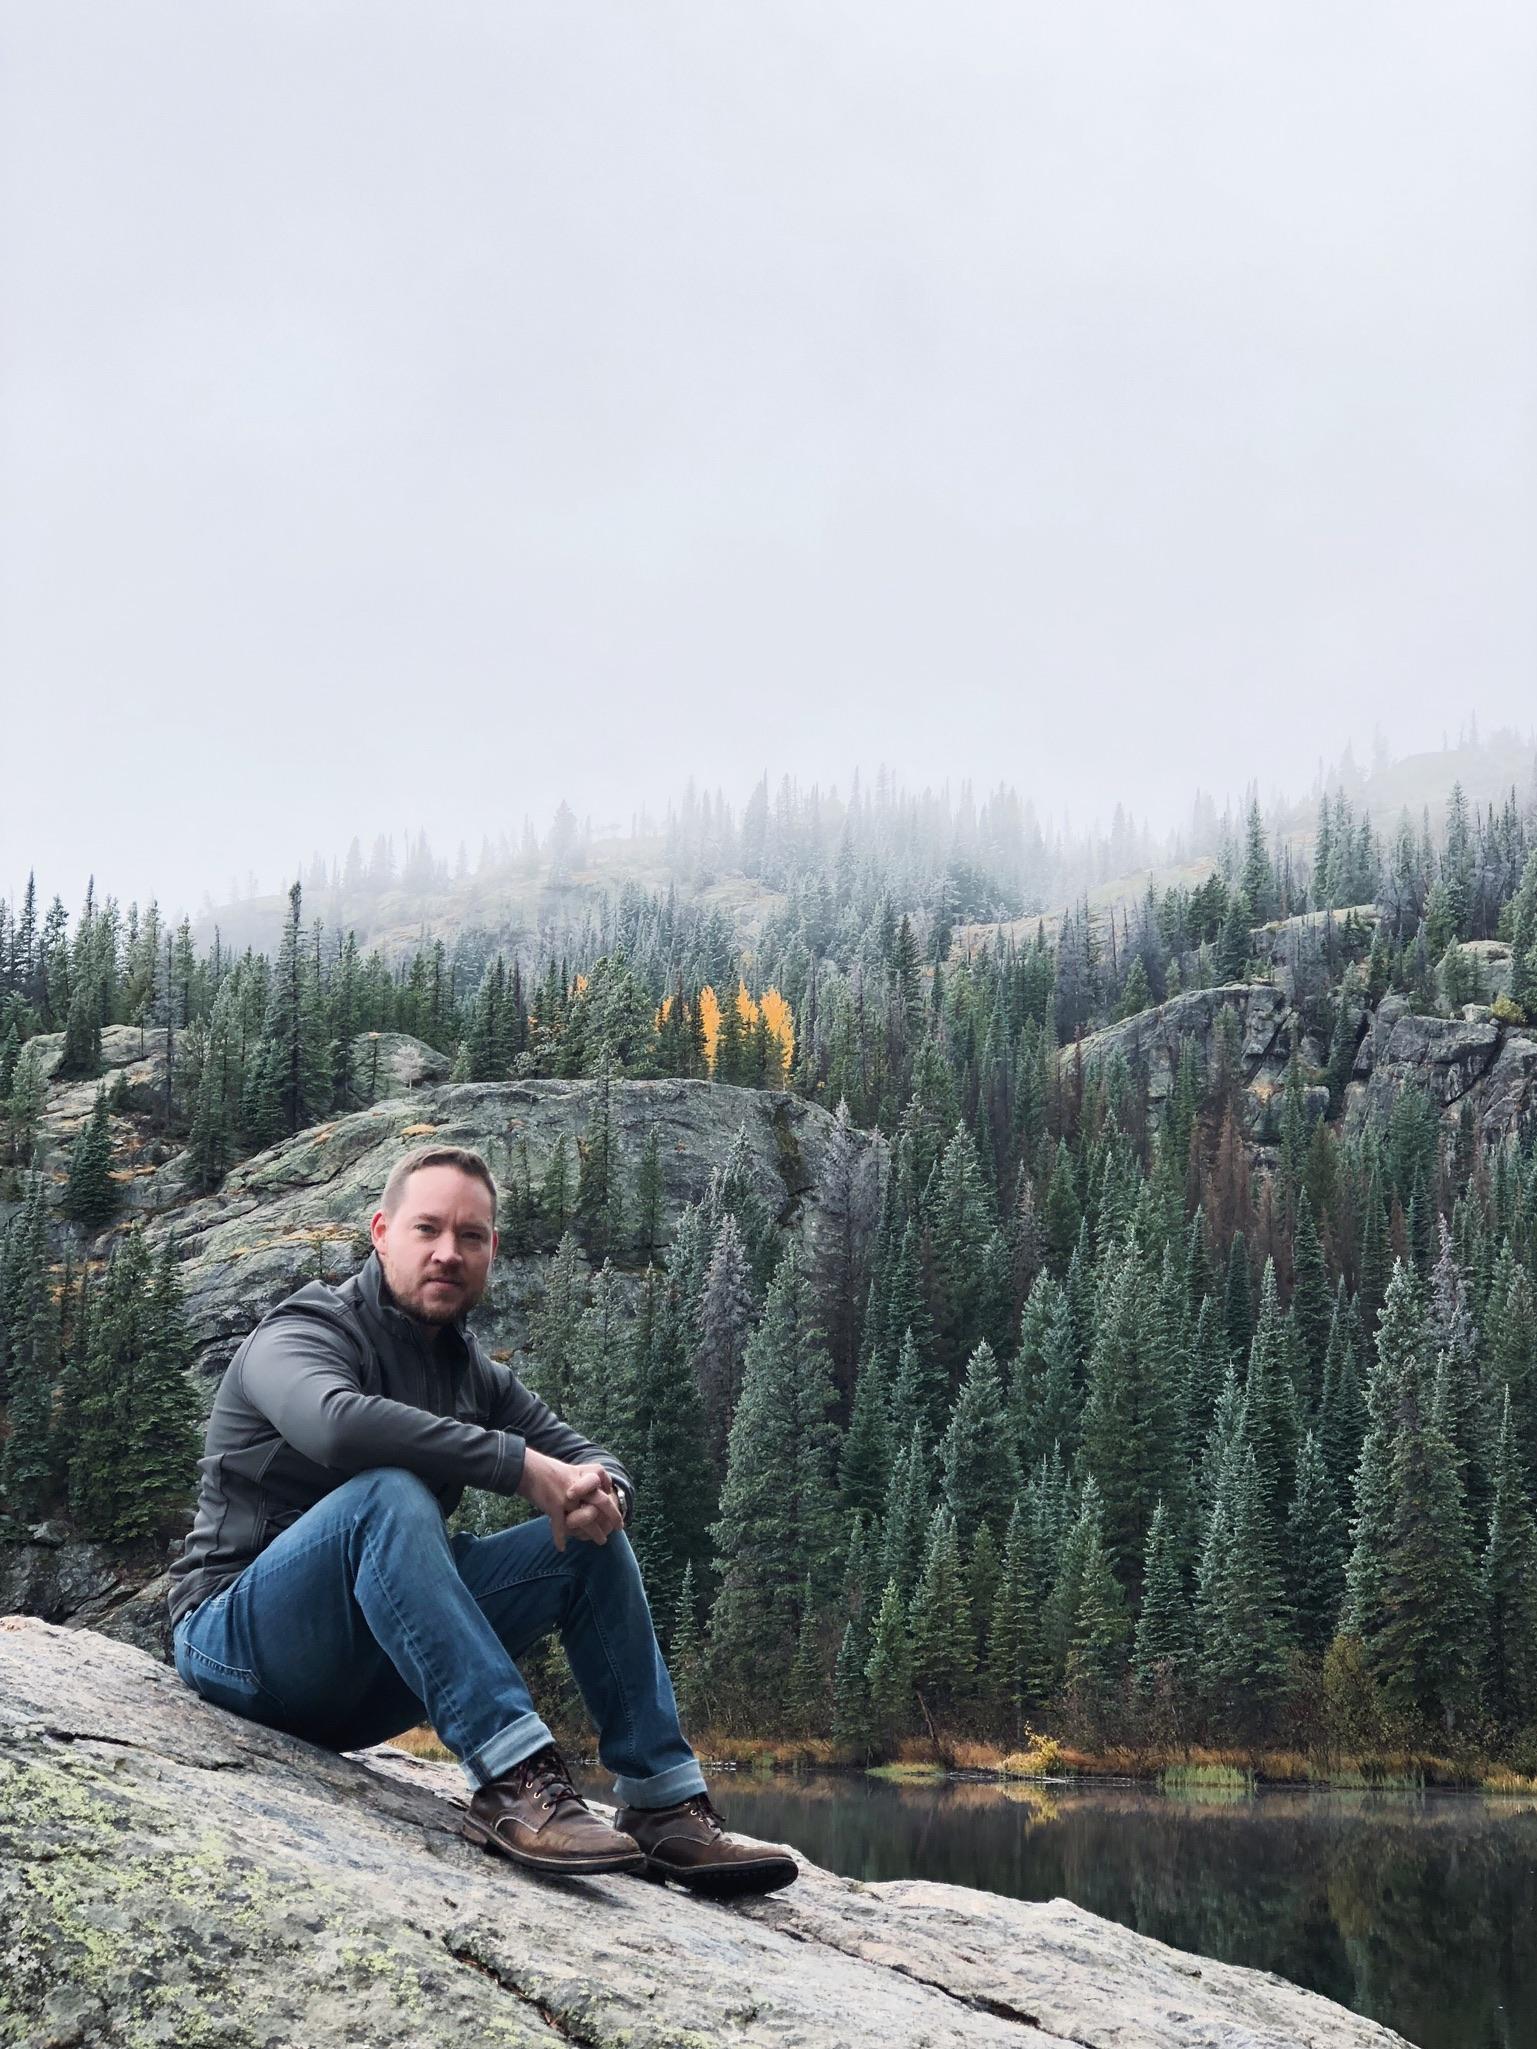 LoveNothingMore-Rocky-Mountain-National-Park